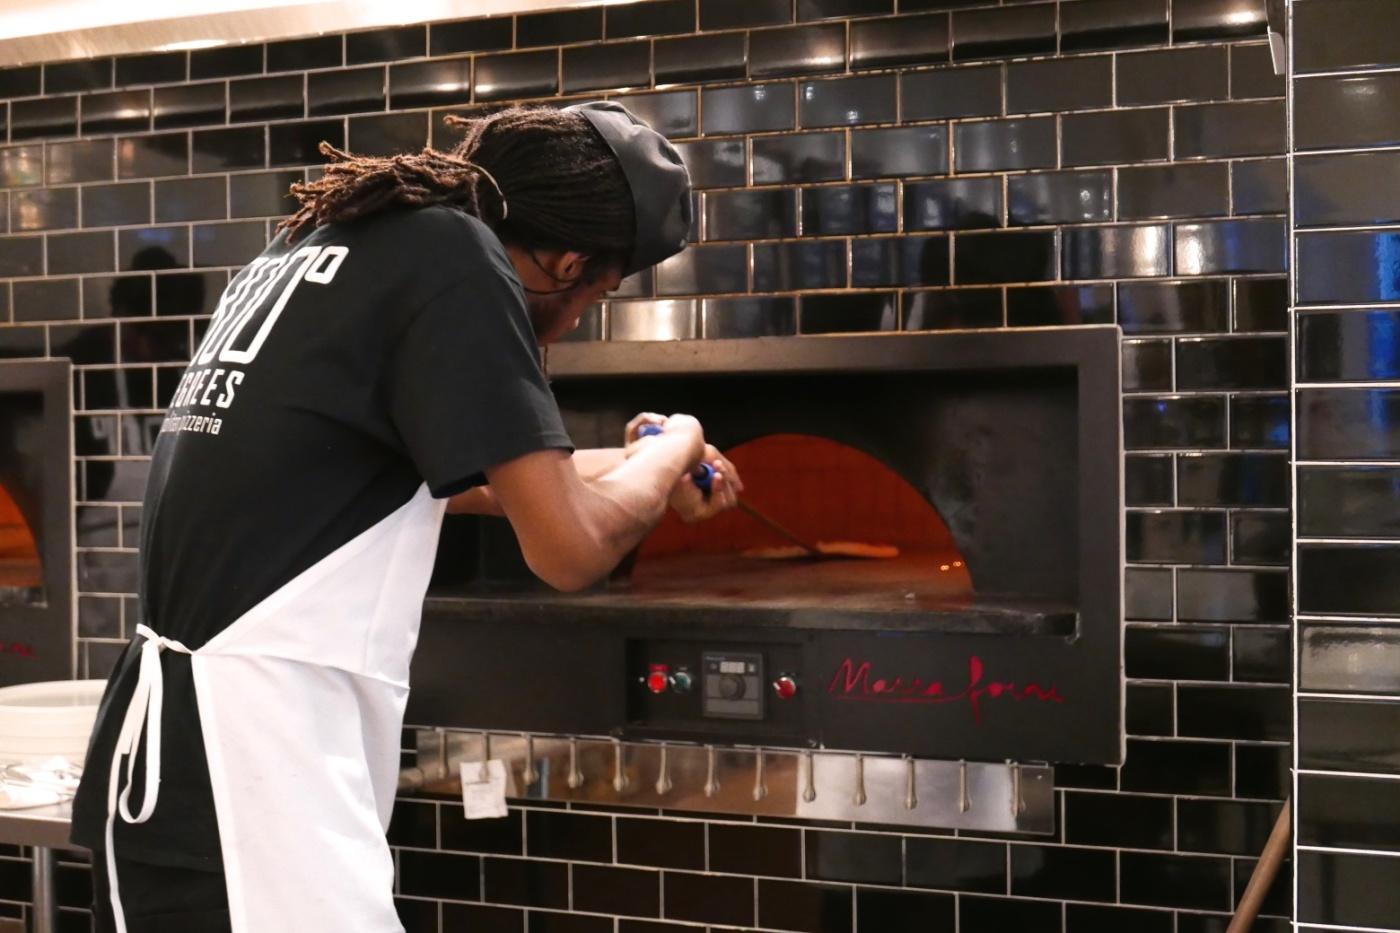 2015_10_08 800 degrees pizza 007